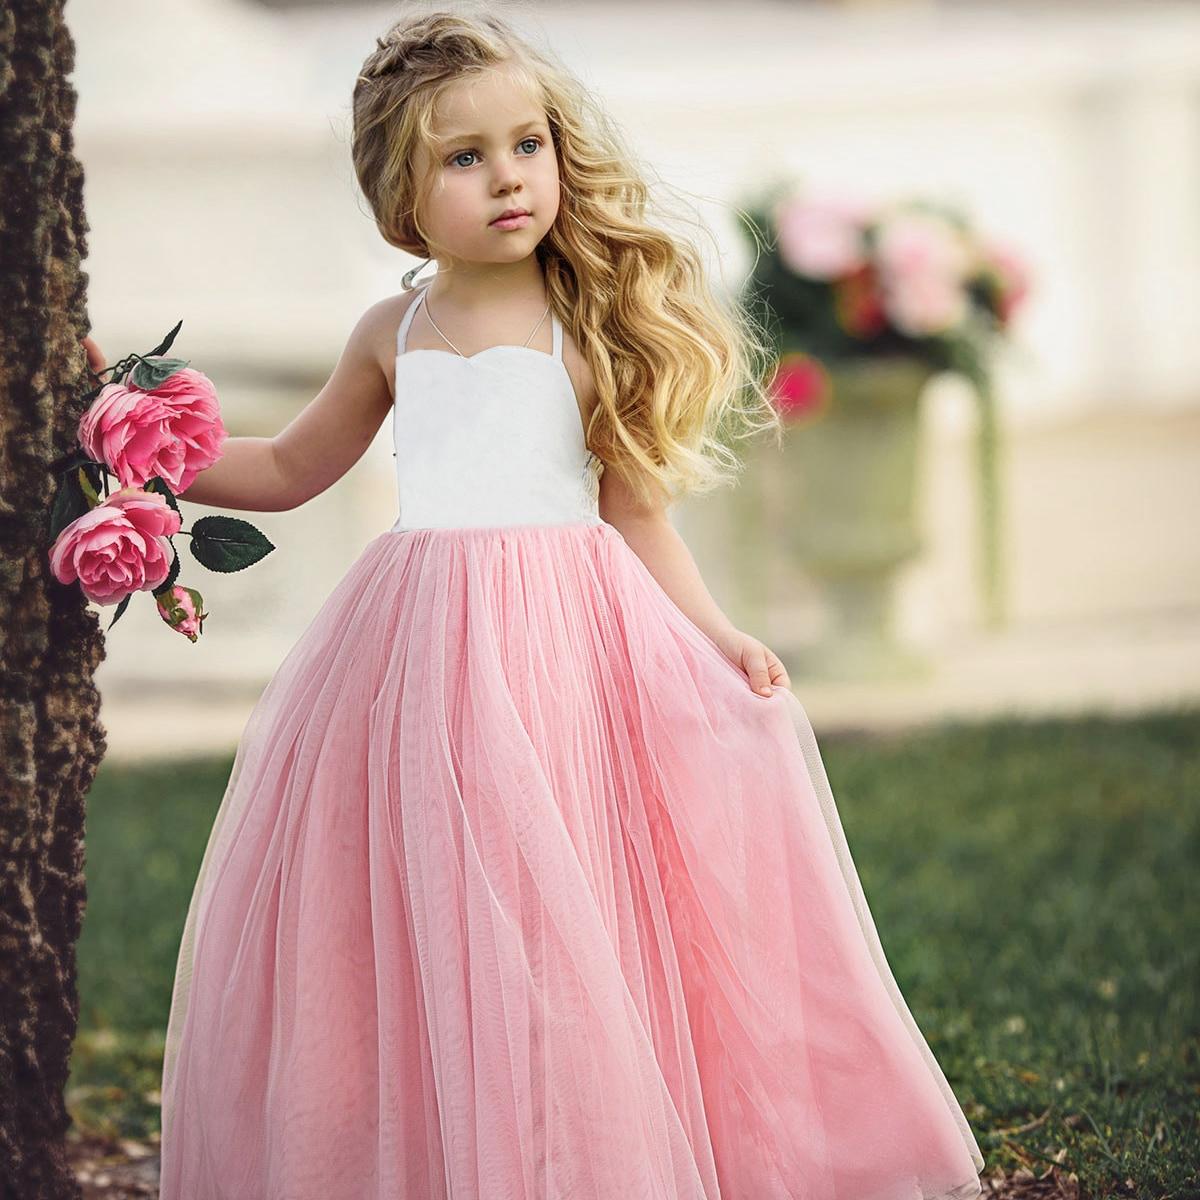 Vistoso Paloma Vestidos De Dama Gris Motivo - Colección de Vestidos ...